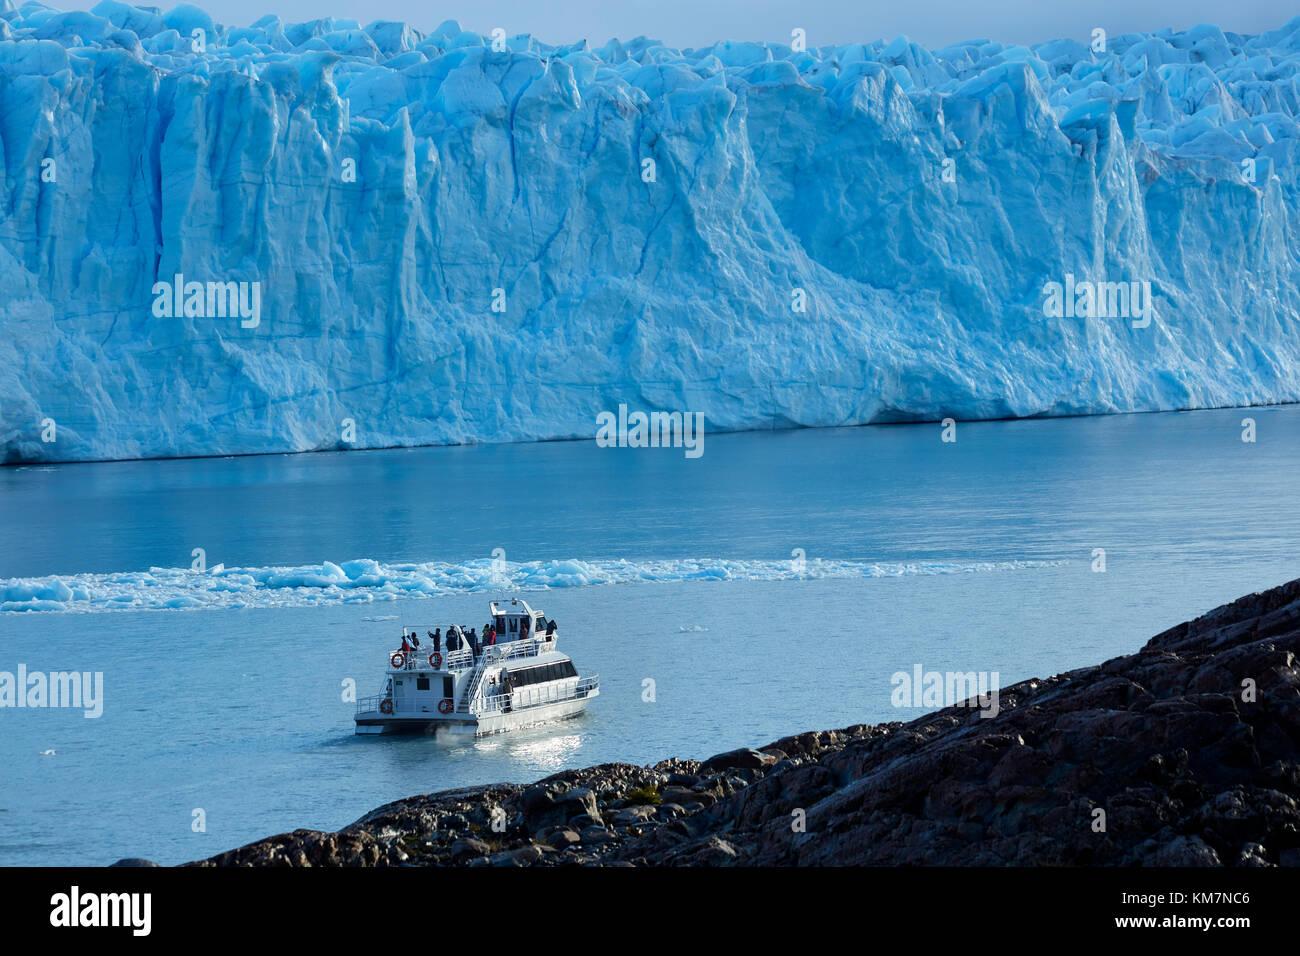 Tourist boat and Perito Moreno Glacier, Parque Nacional Los Glaciares (World Heritage Area), Patagonia, Argentina, - Stock Image